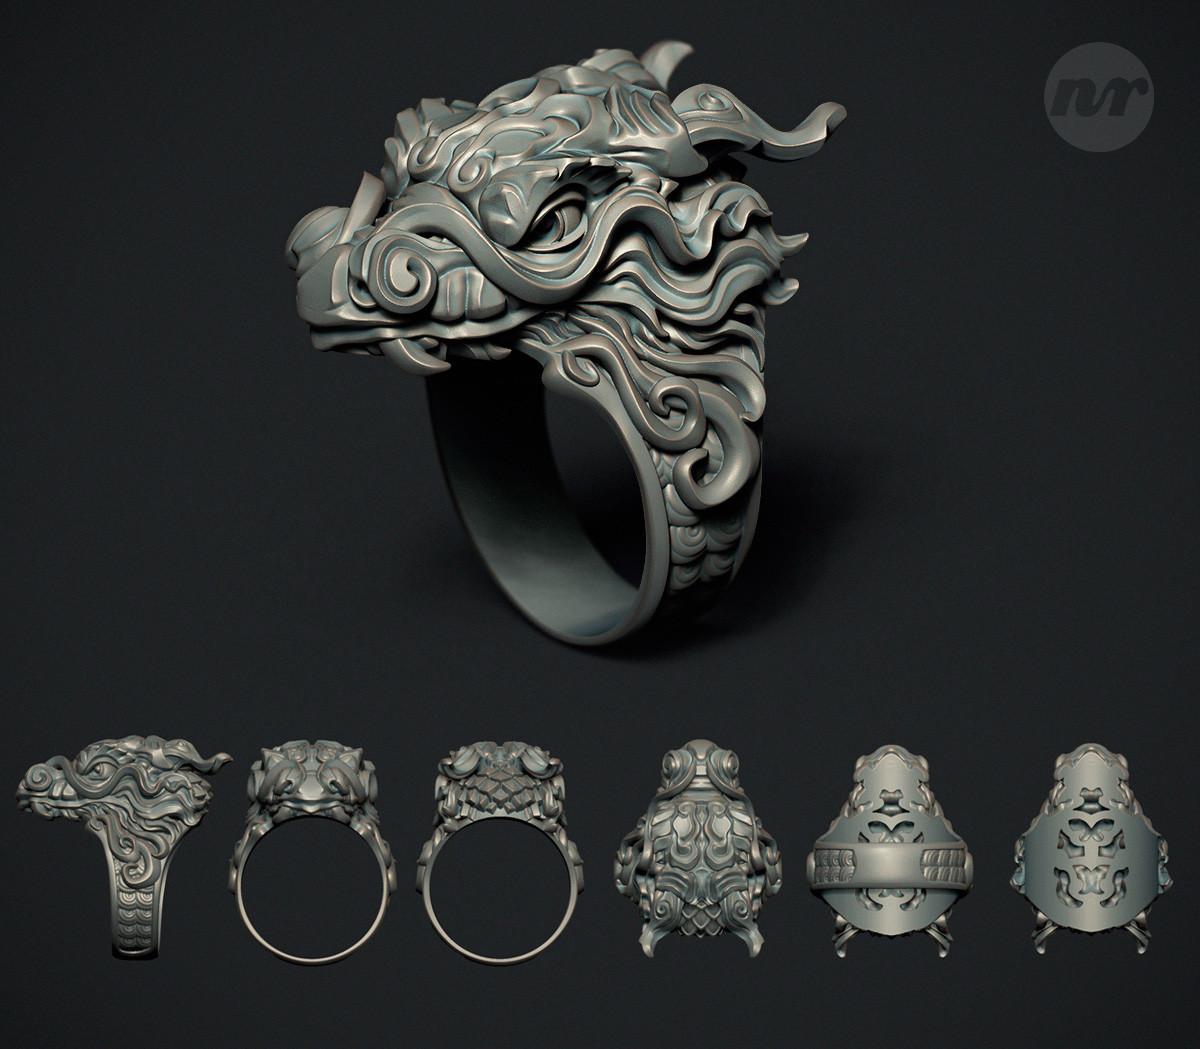 Nacho riesco gostanza anillo dragon zbr 500k